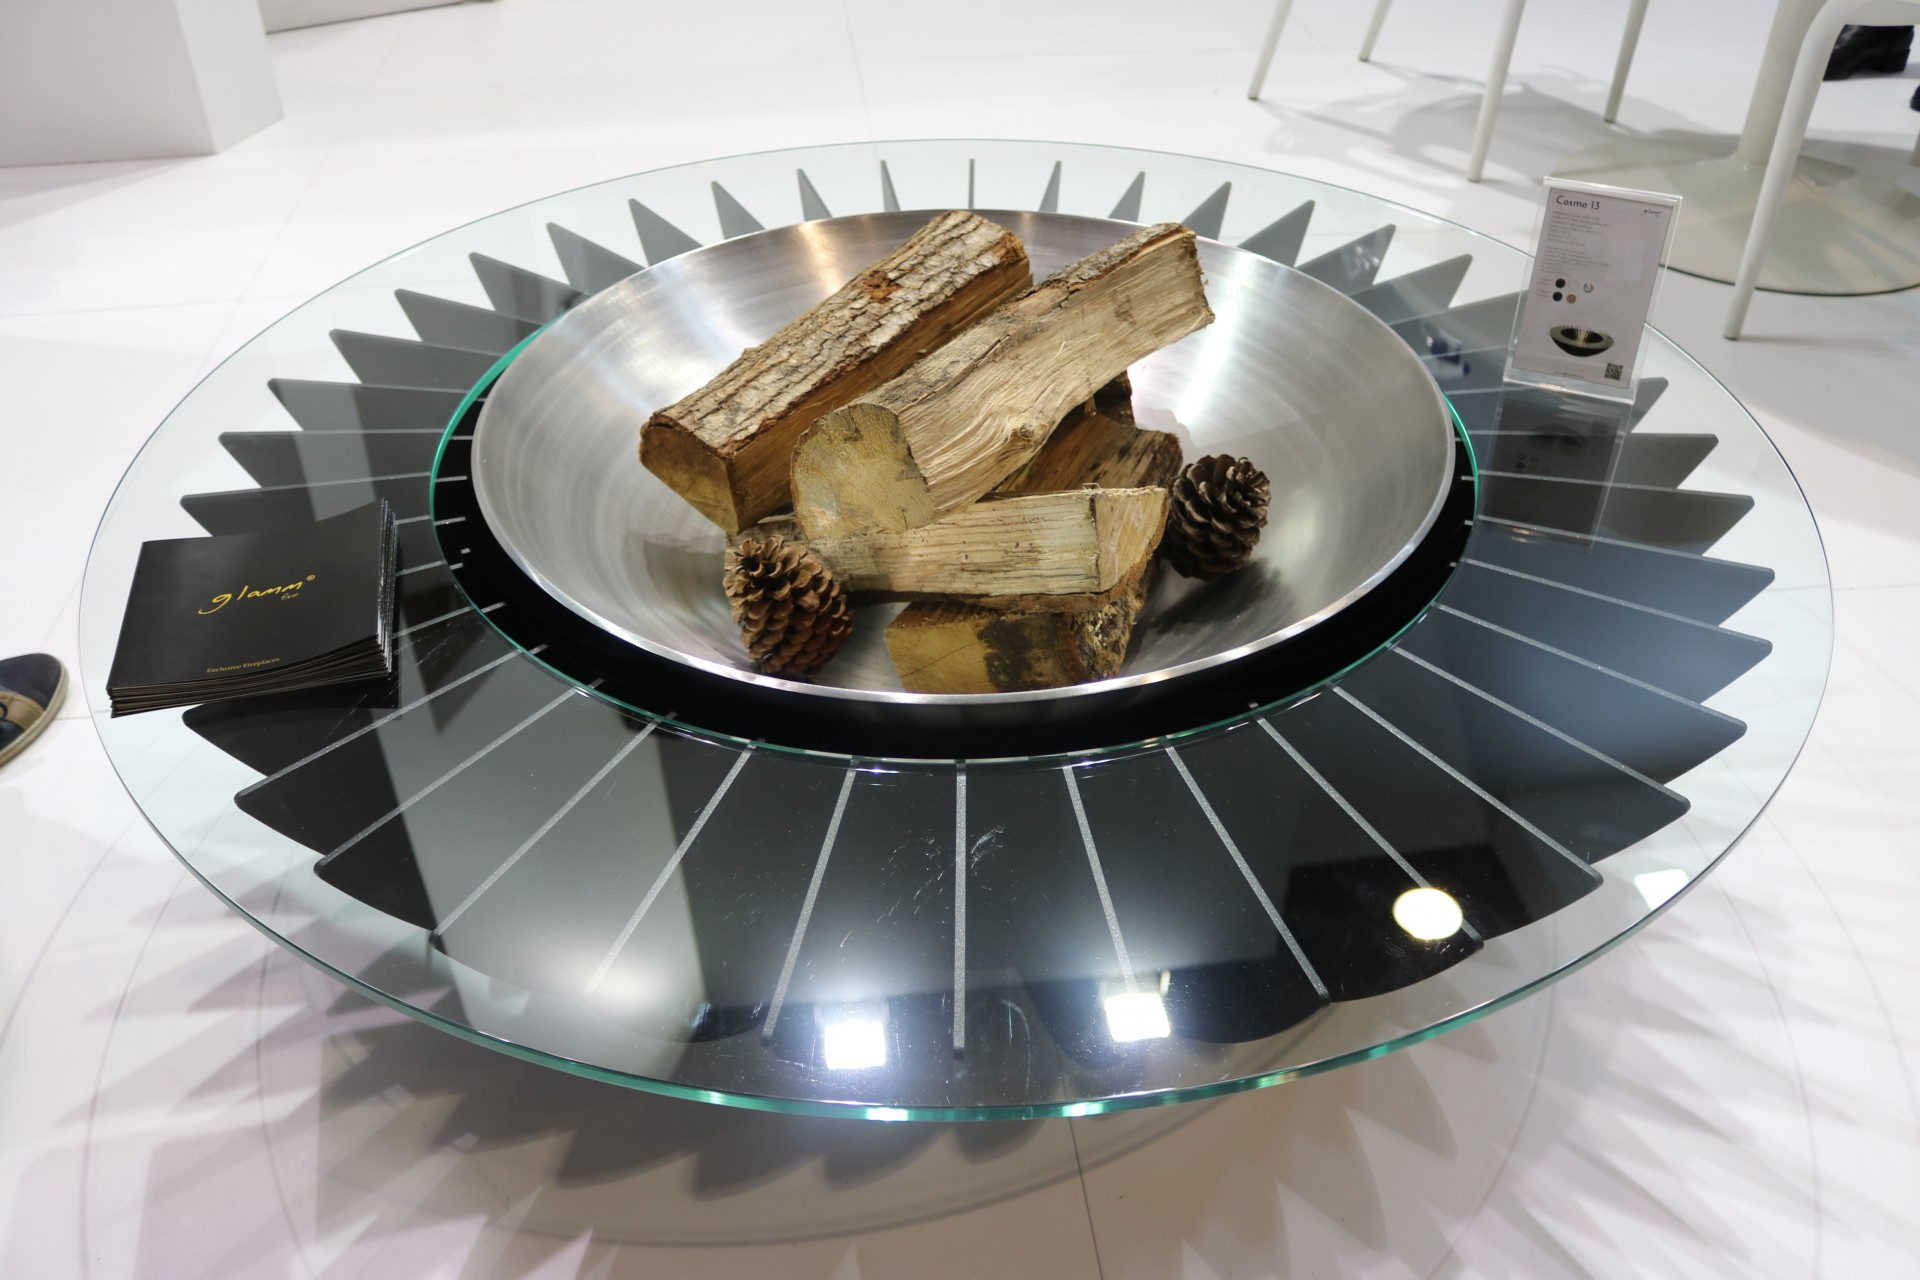 objet design cuisine simple accessoire cuisine design lovely accessoire cuisine design objet. Black Bedroom Furniture Sets. Home Design Ideas